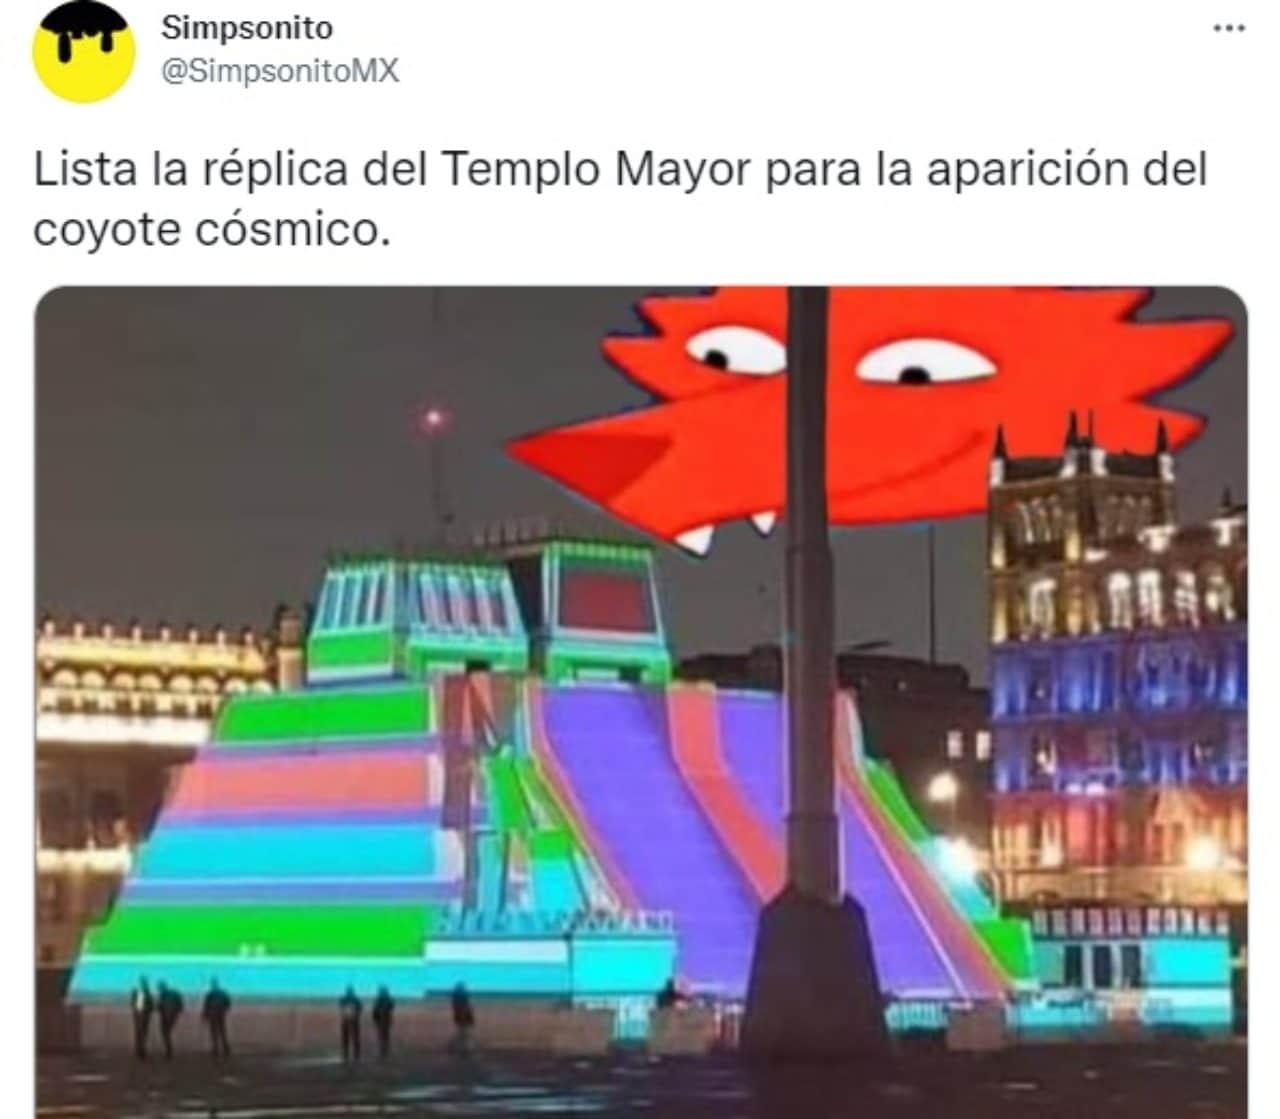 meme maqueta templo mayor zocalo cdmx